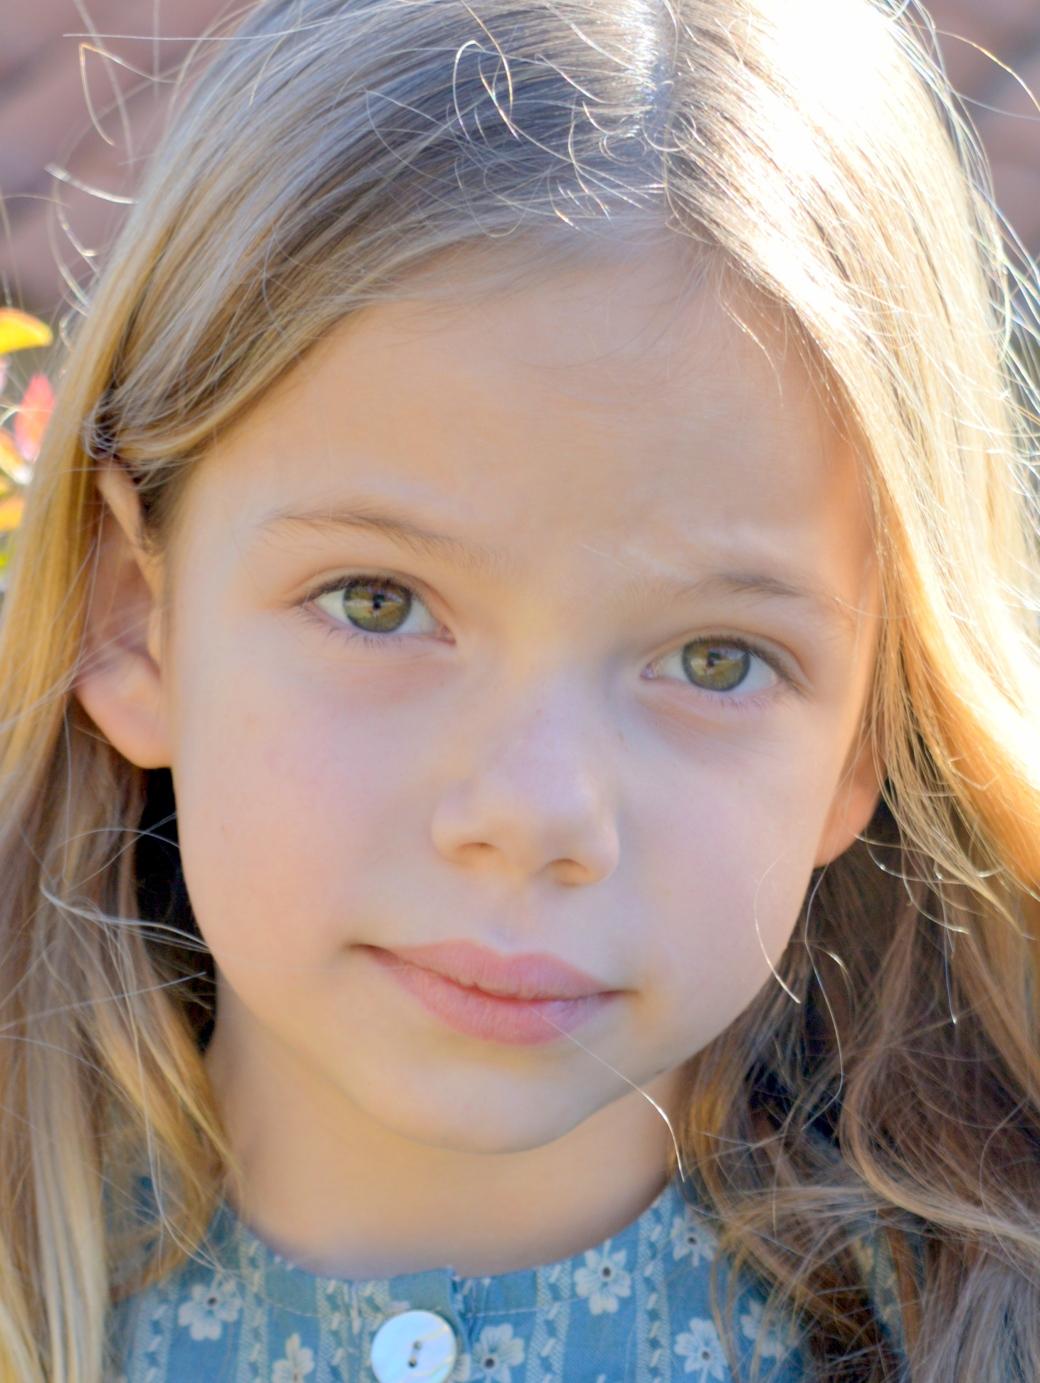 moodblue blog de moda infantil y juvenil 13